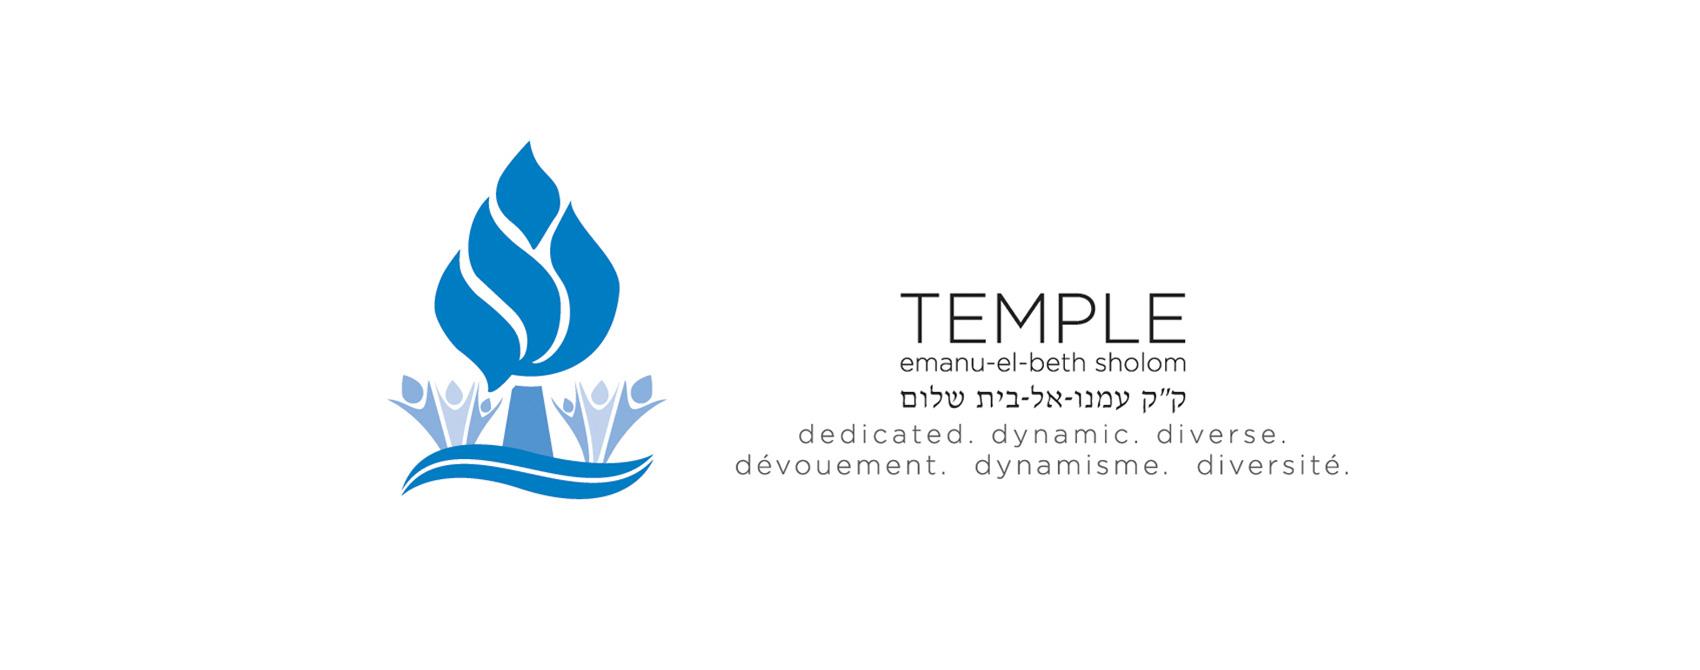 temple emanuel montreal